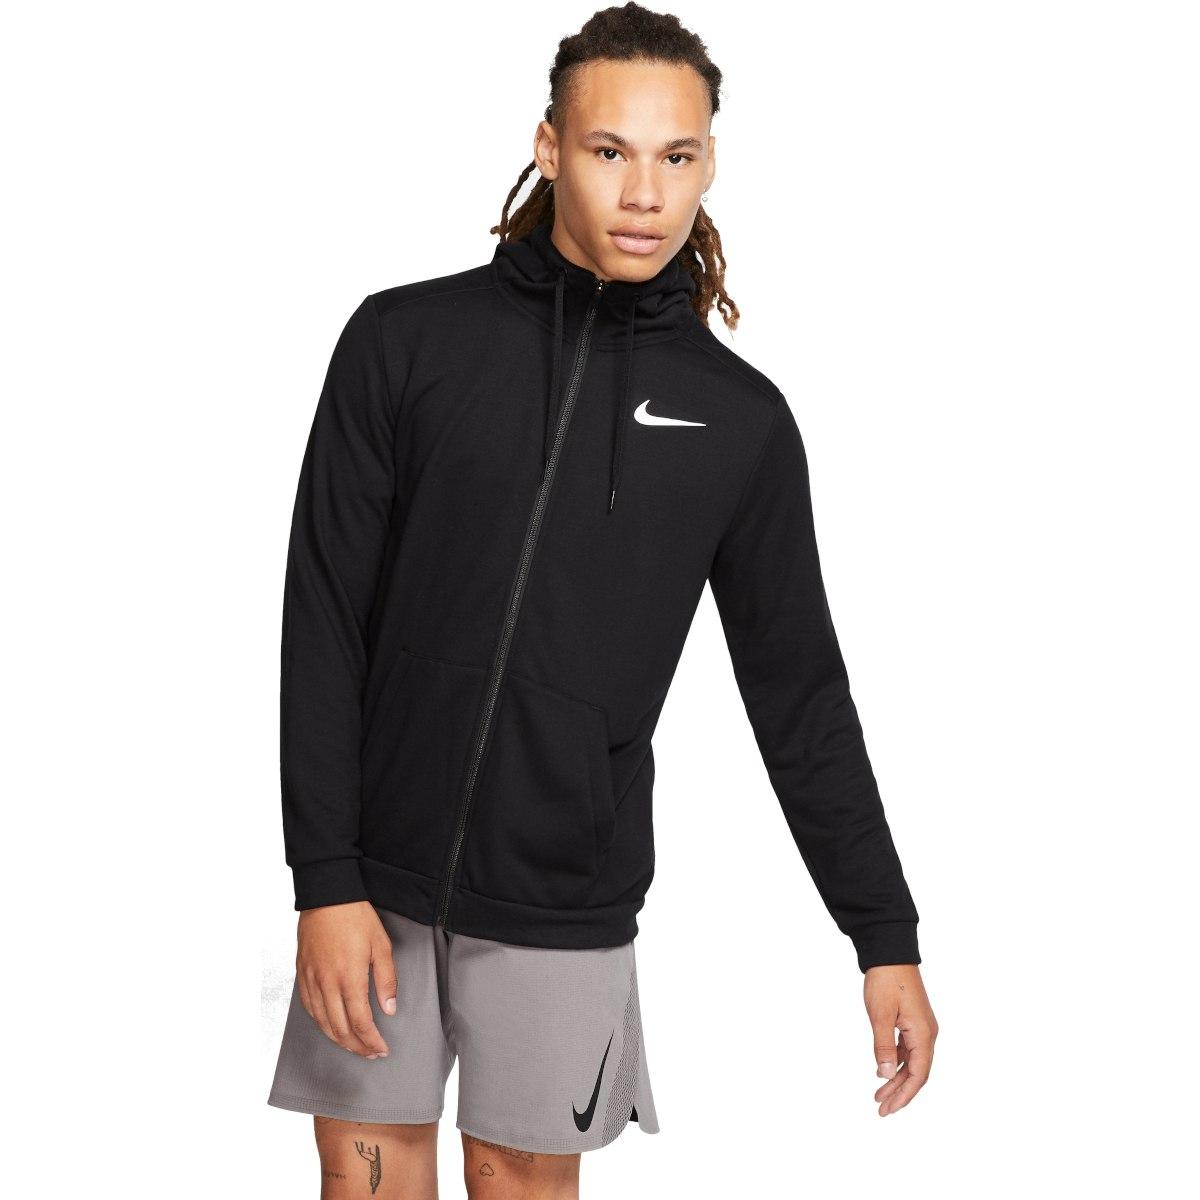 Foto de Nike Dri-FIT Men's Full-Zip Training Hoodie - black/white CJ4317-010